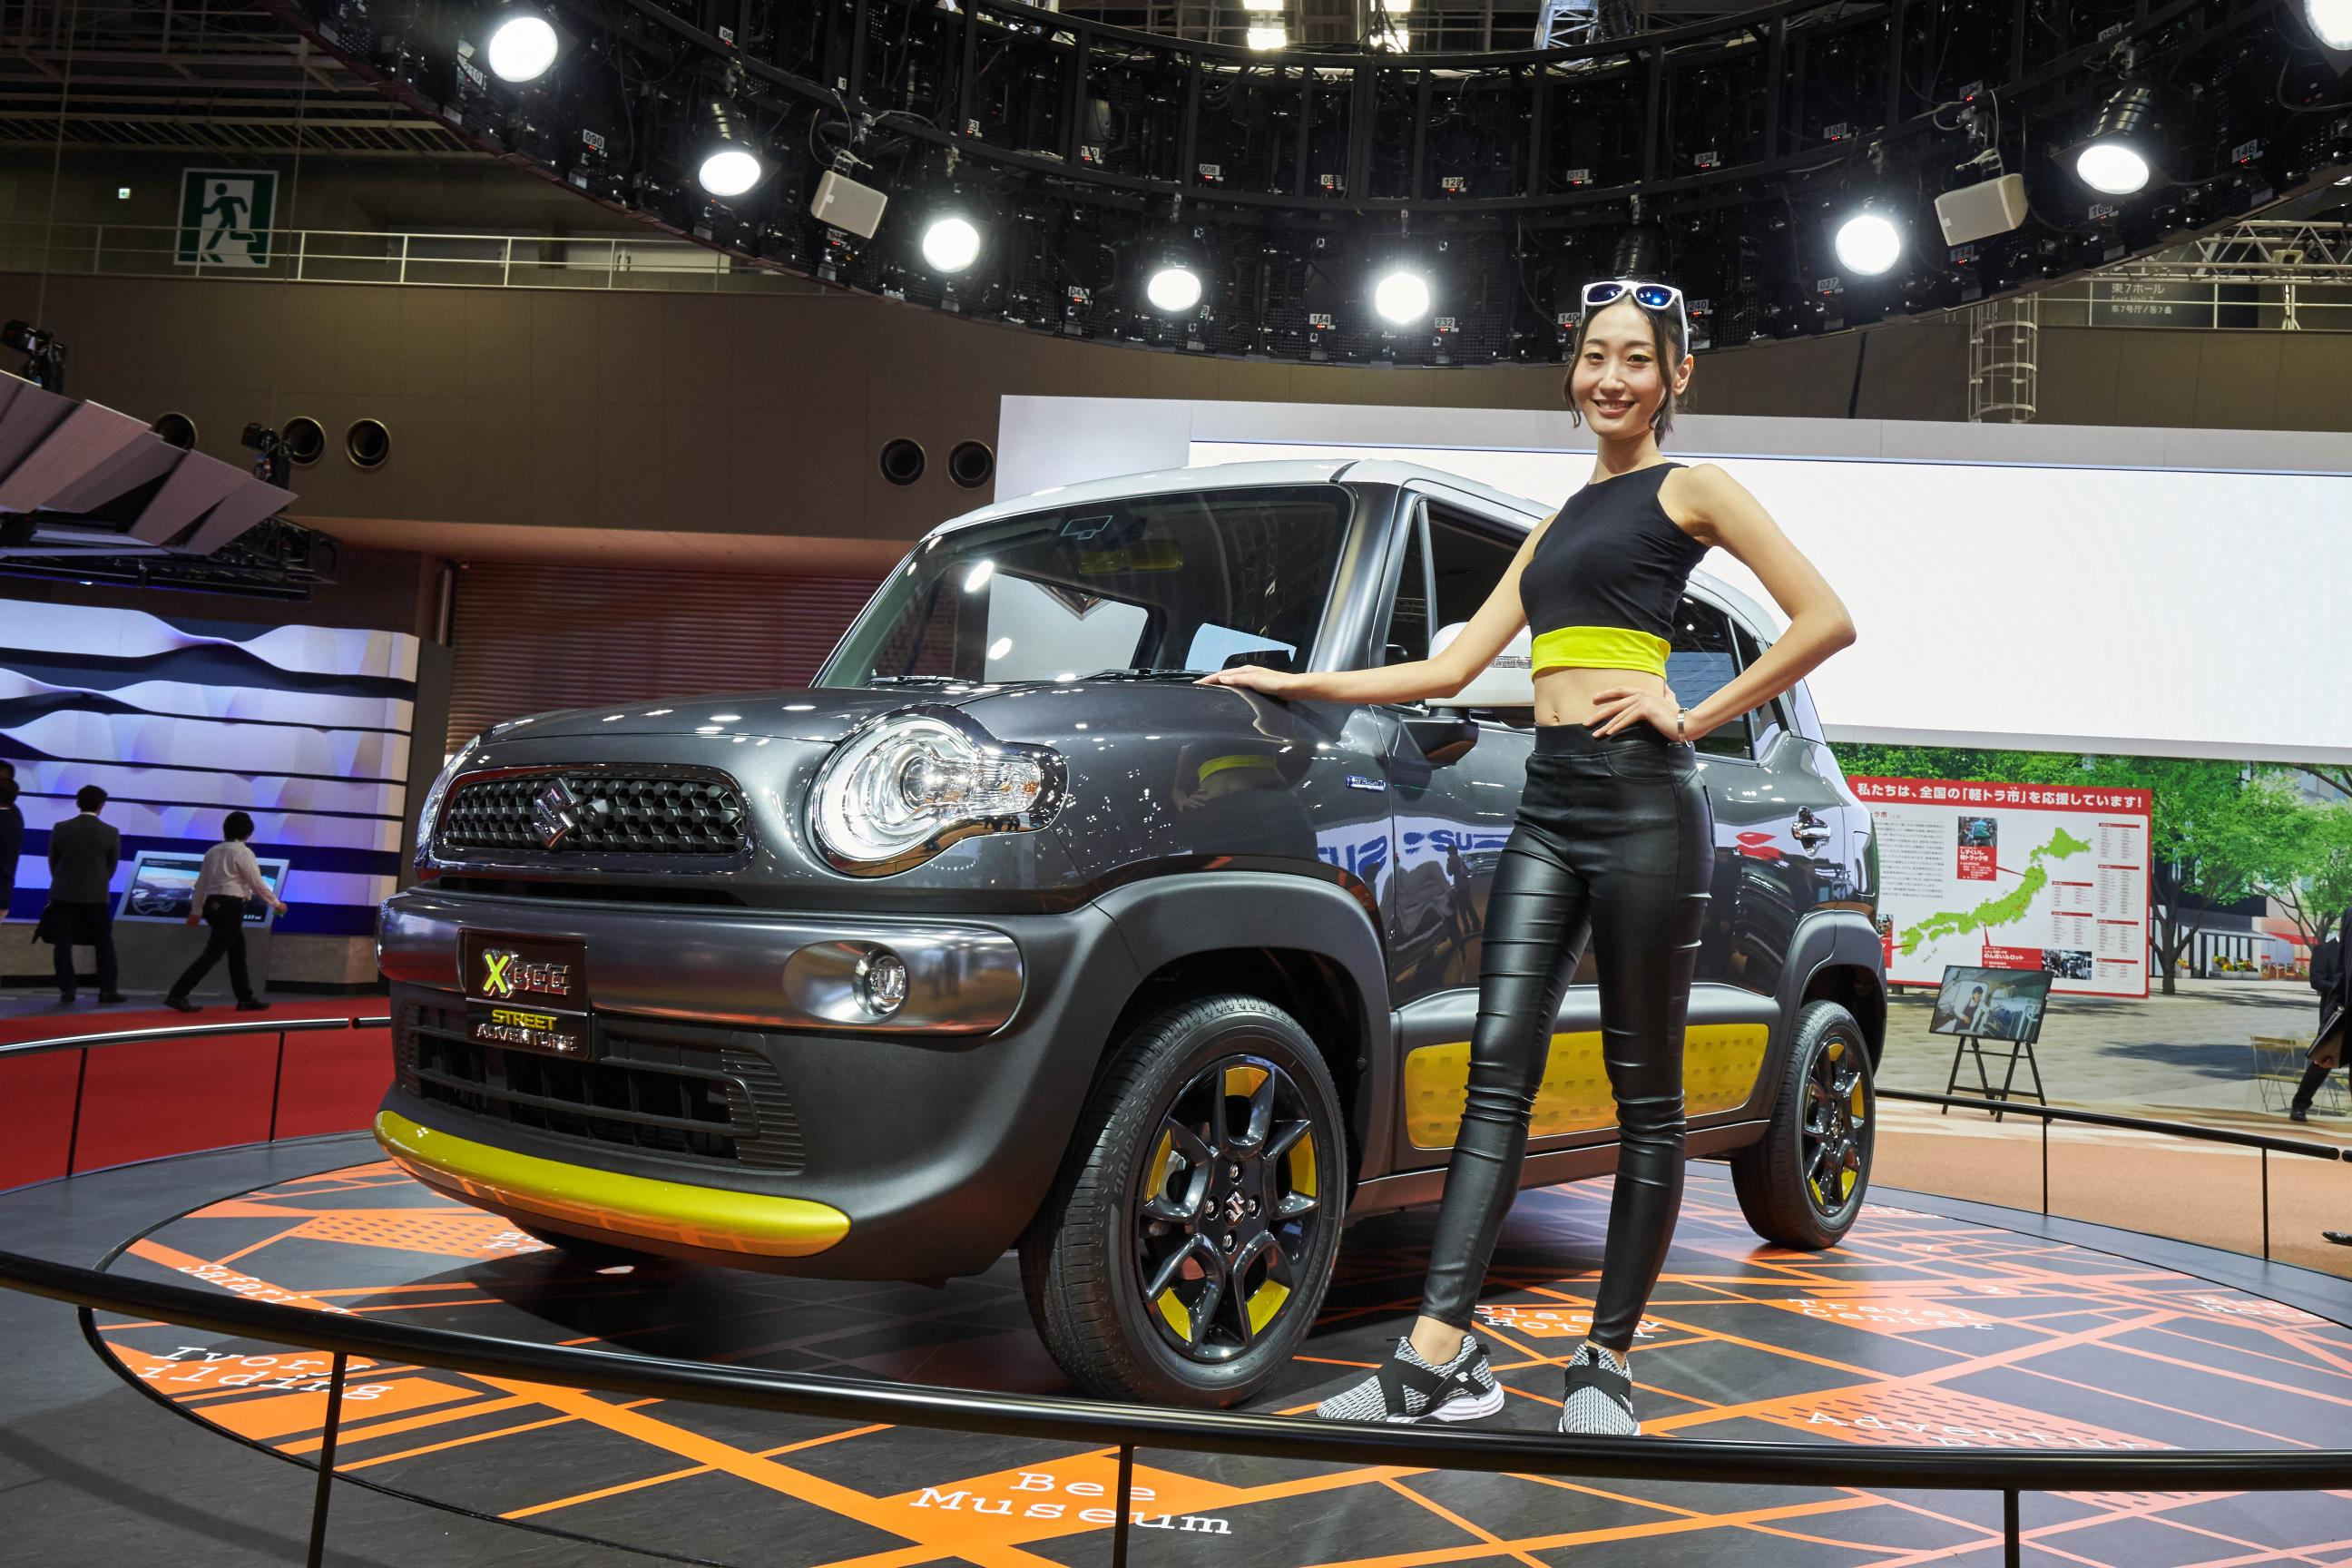 Tokyo motor show 2017 (340)